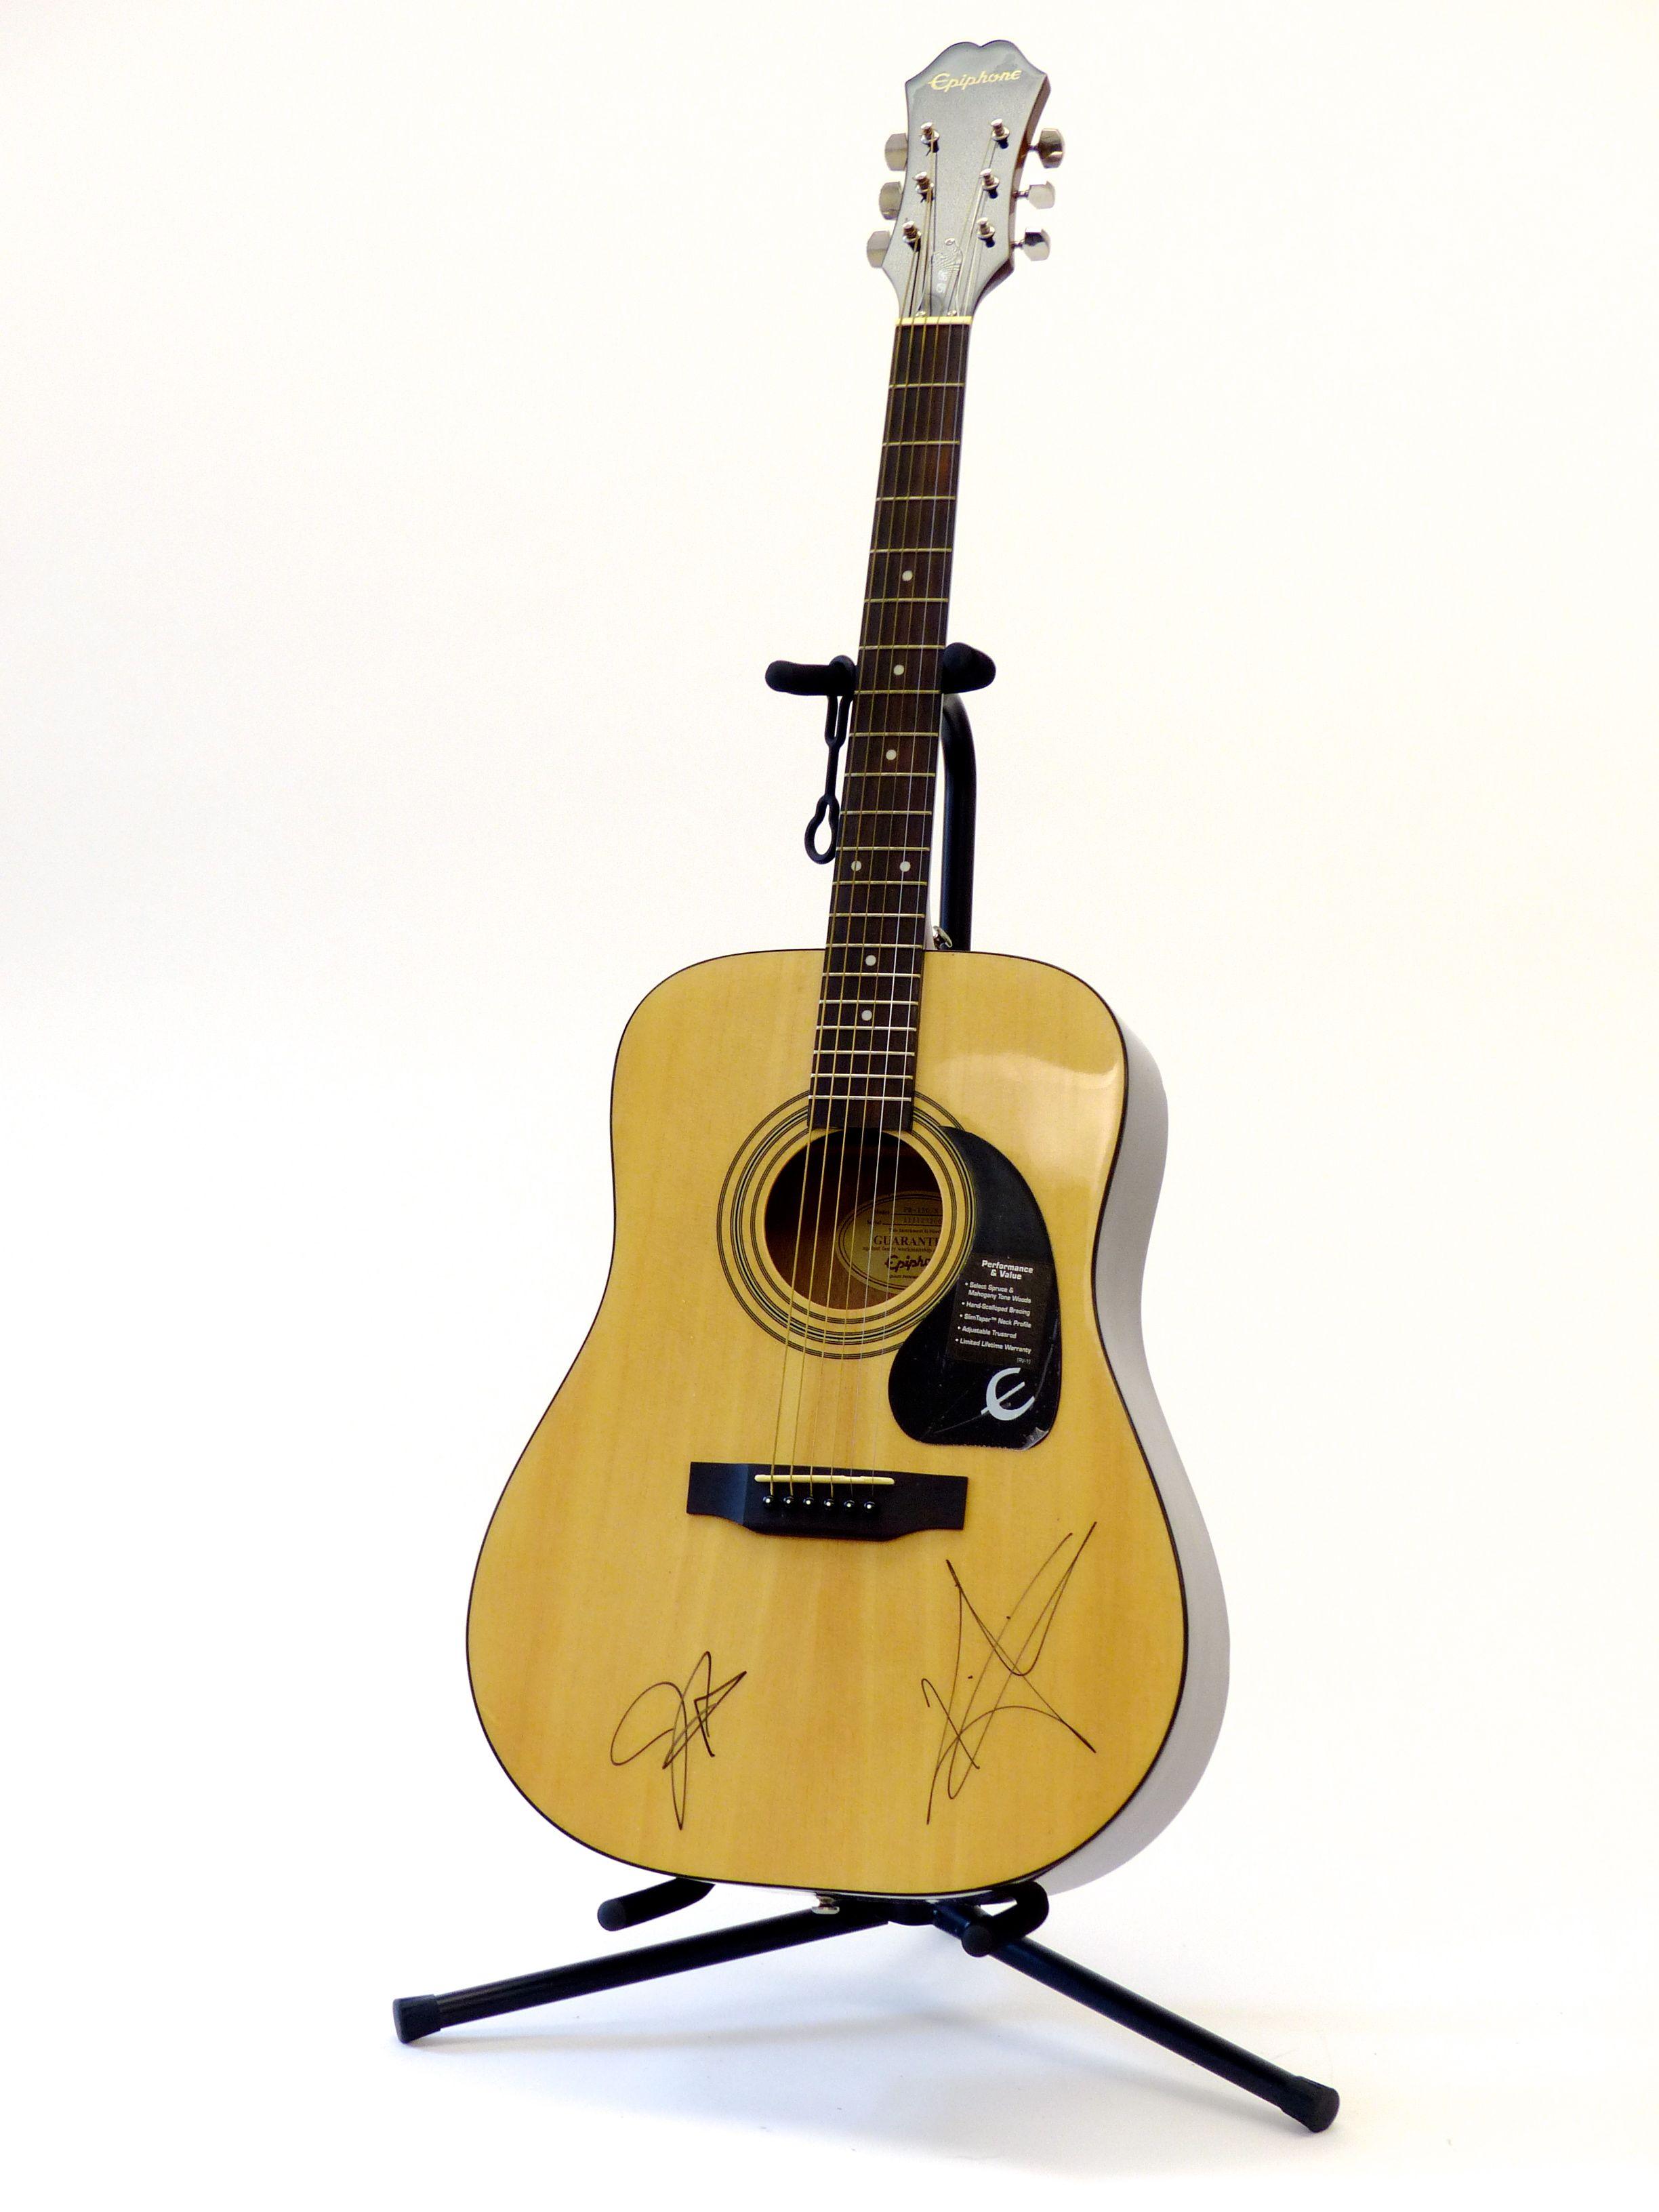 Sugarland Stay Guitar